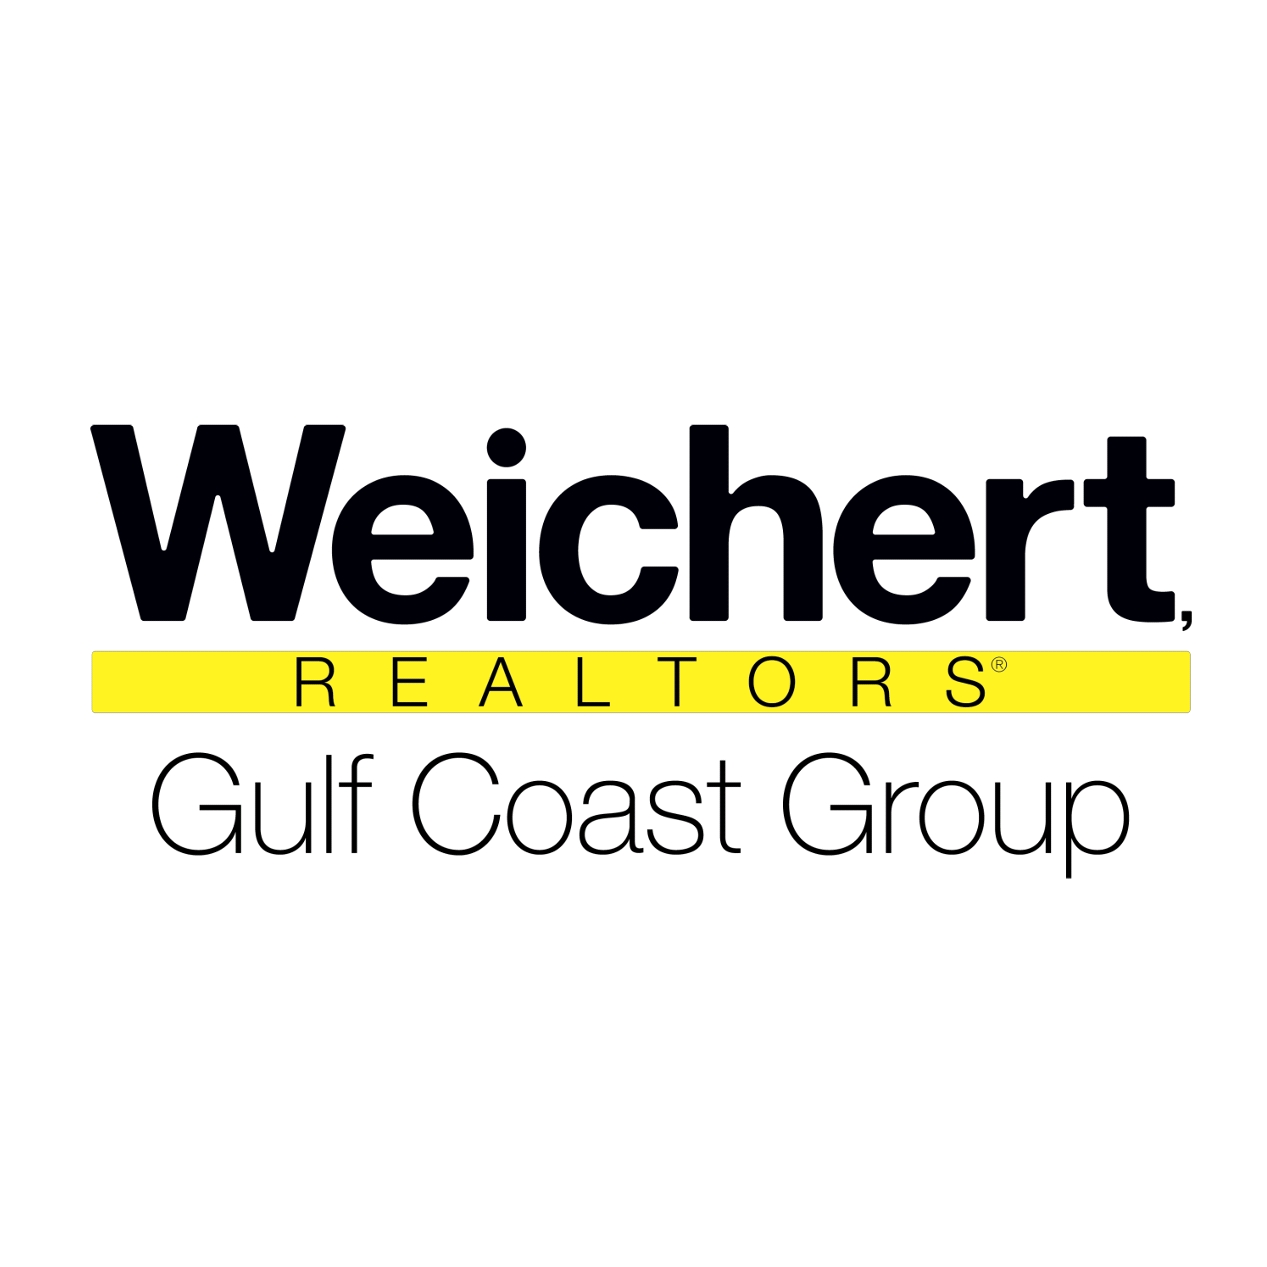 Weichert, Realtors Gulf Coast Group Weichert, Realtors Gulf Coast Group